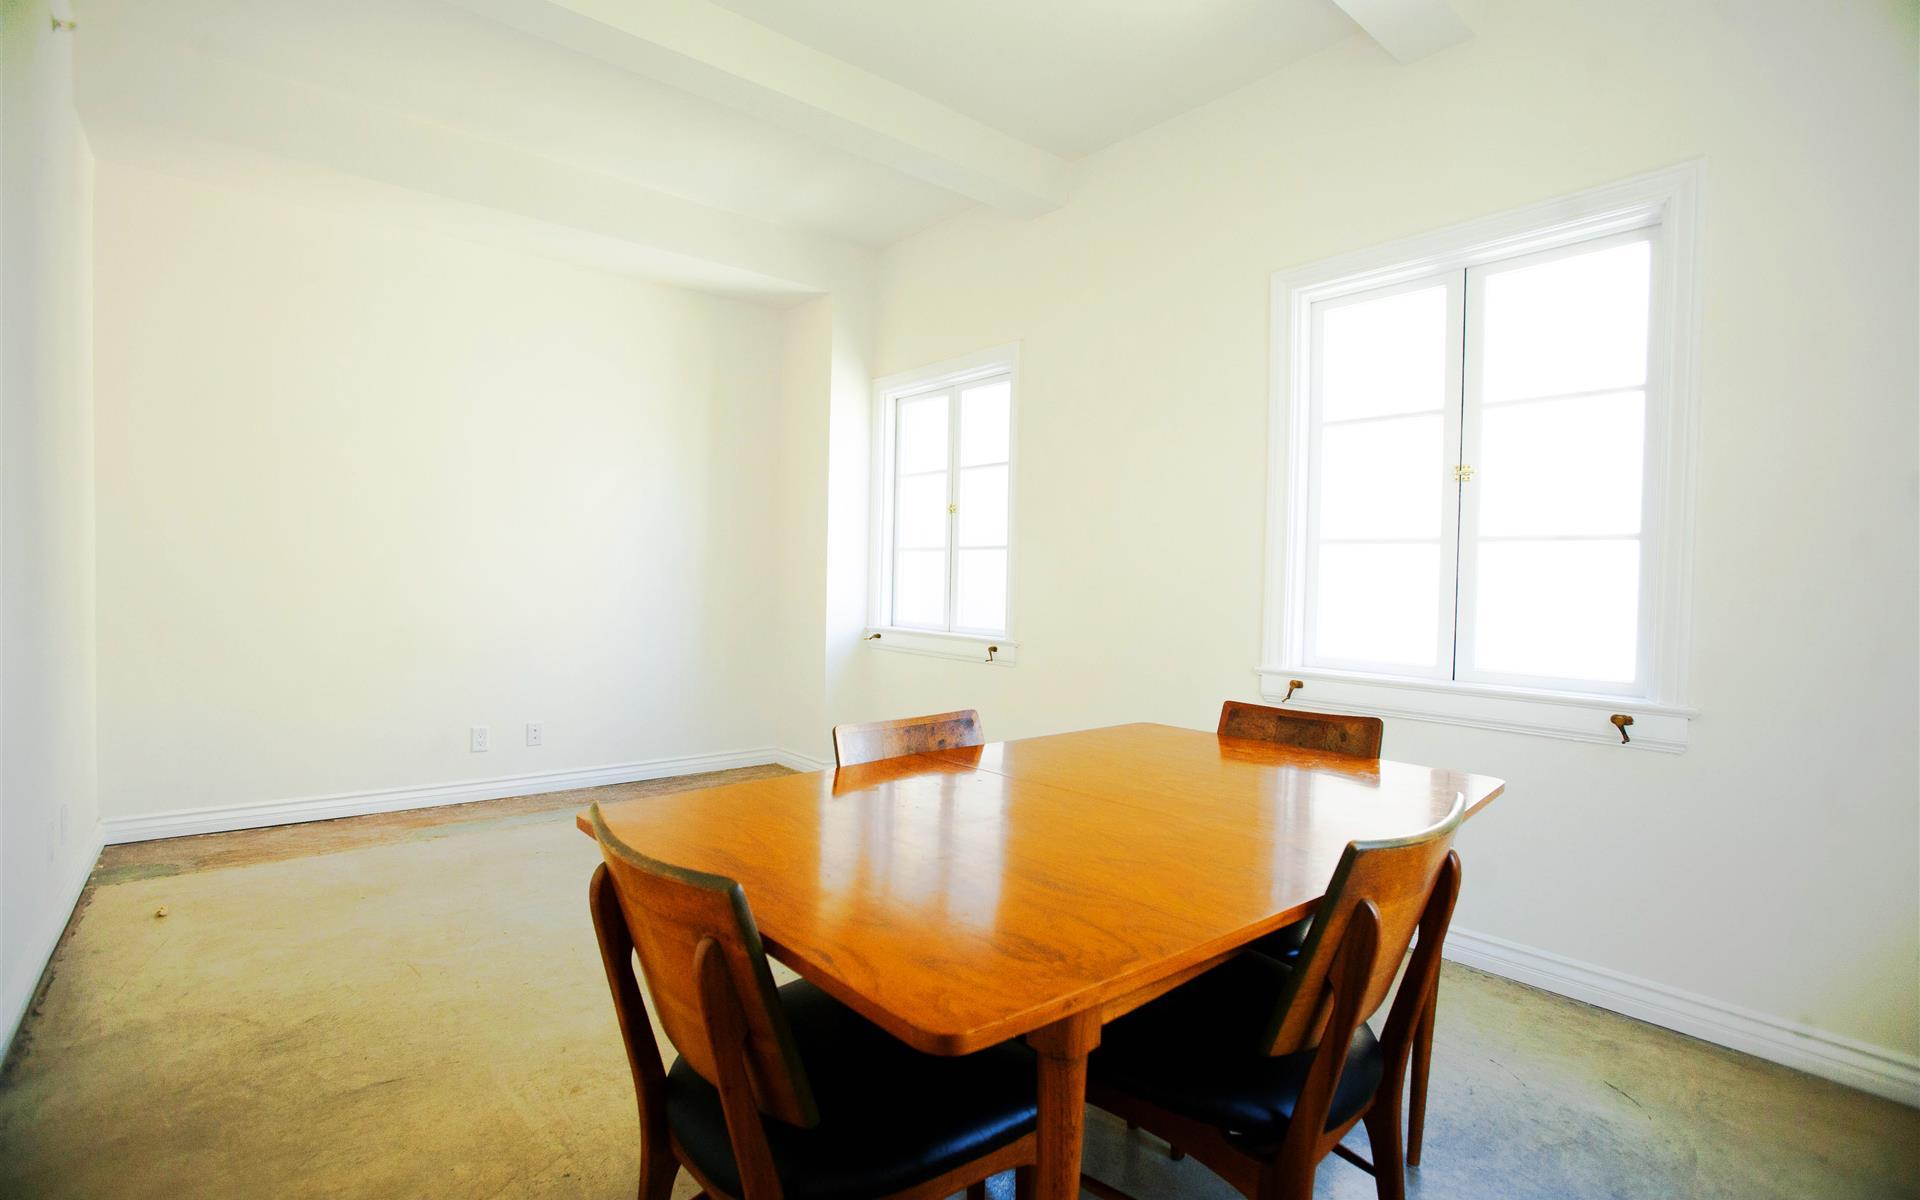 Footprint Productions - Room 1: Sunny Meeting Room